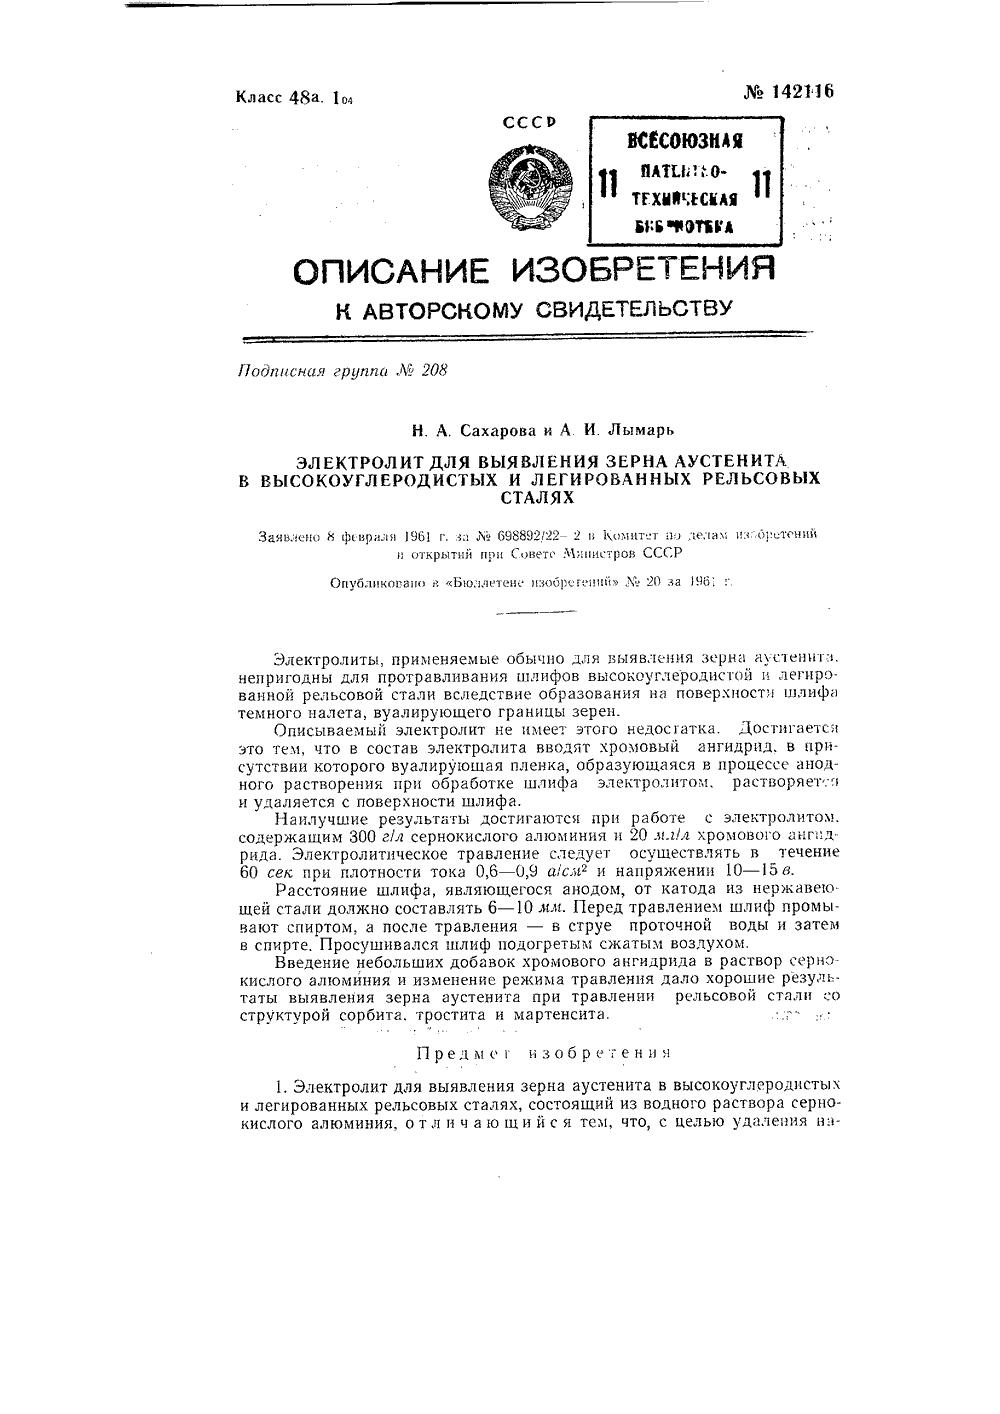 даб циркуляционный насос схема установки ва 35 180